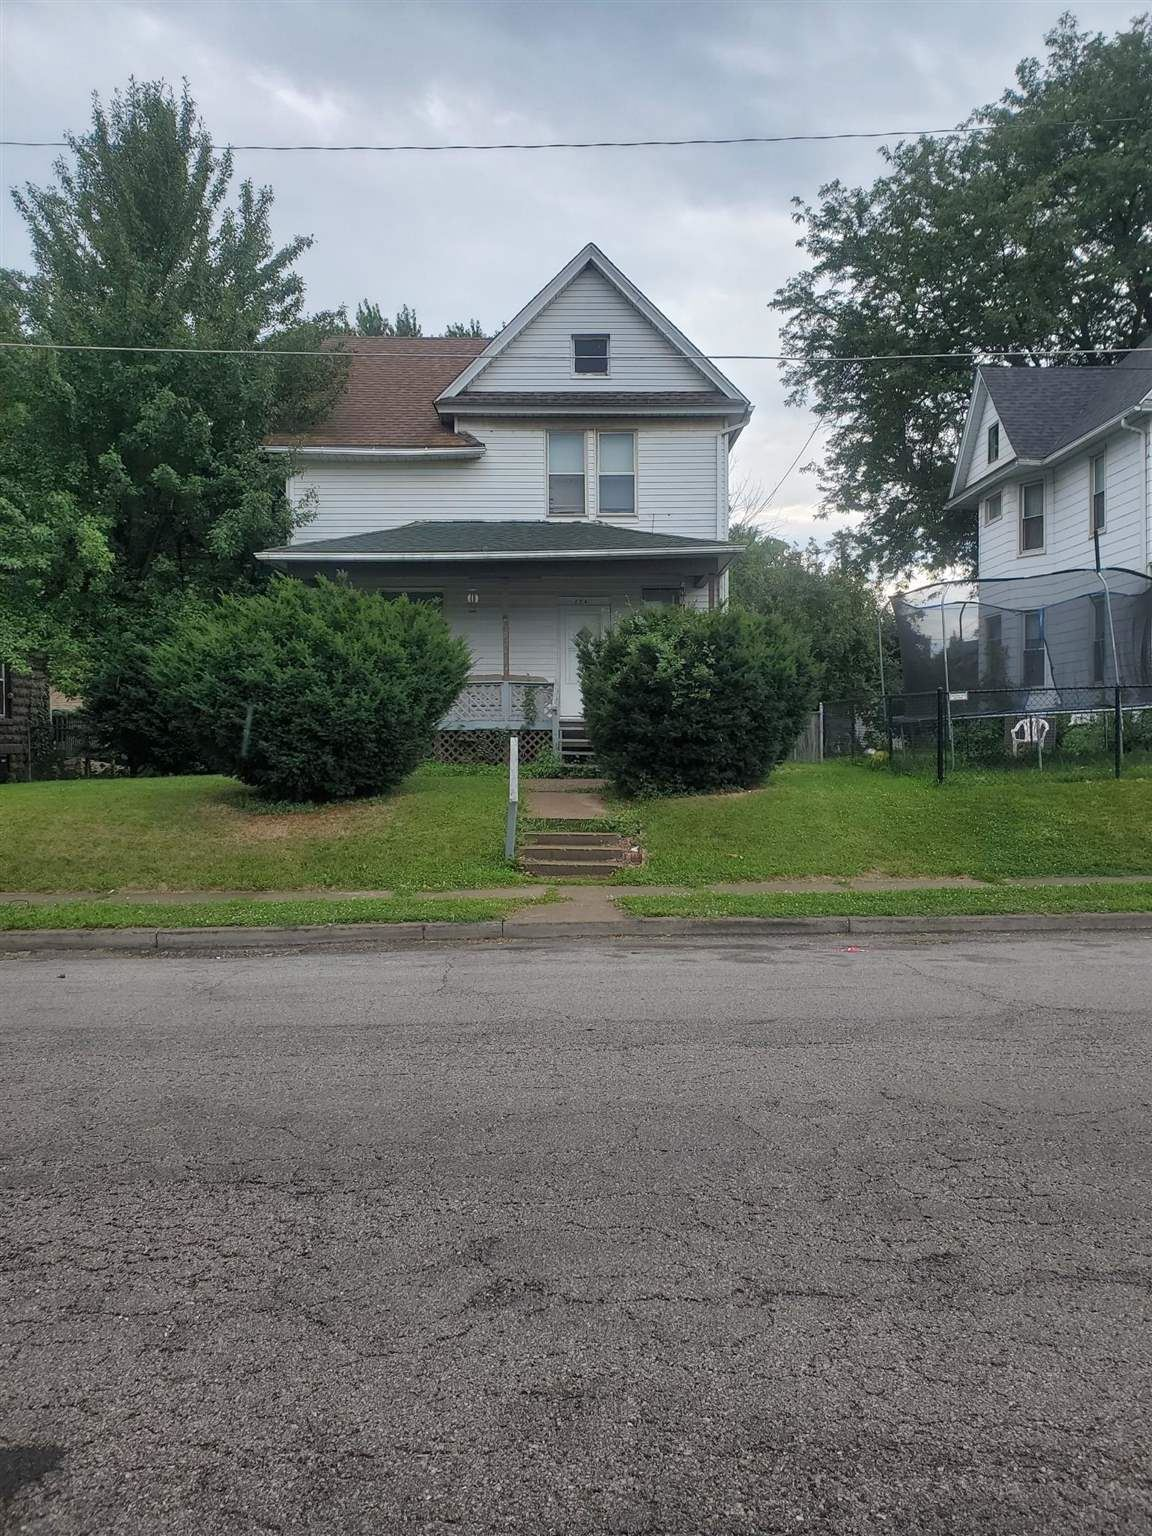 224 S PINE, Davenport, IA 52802 - MLS#: QC4223755